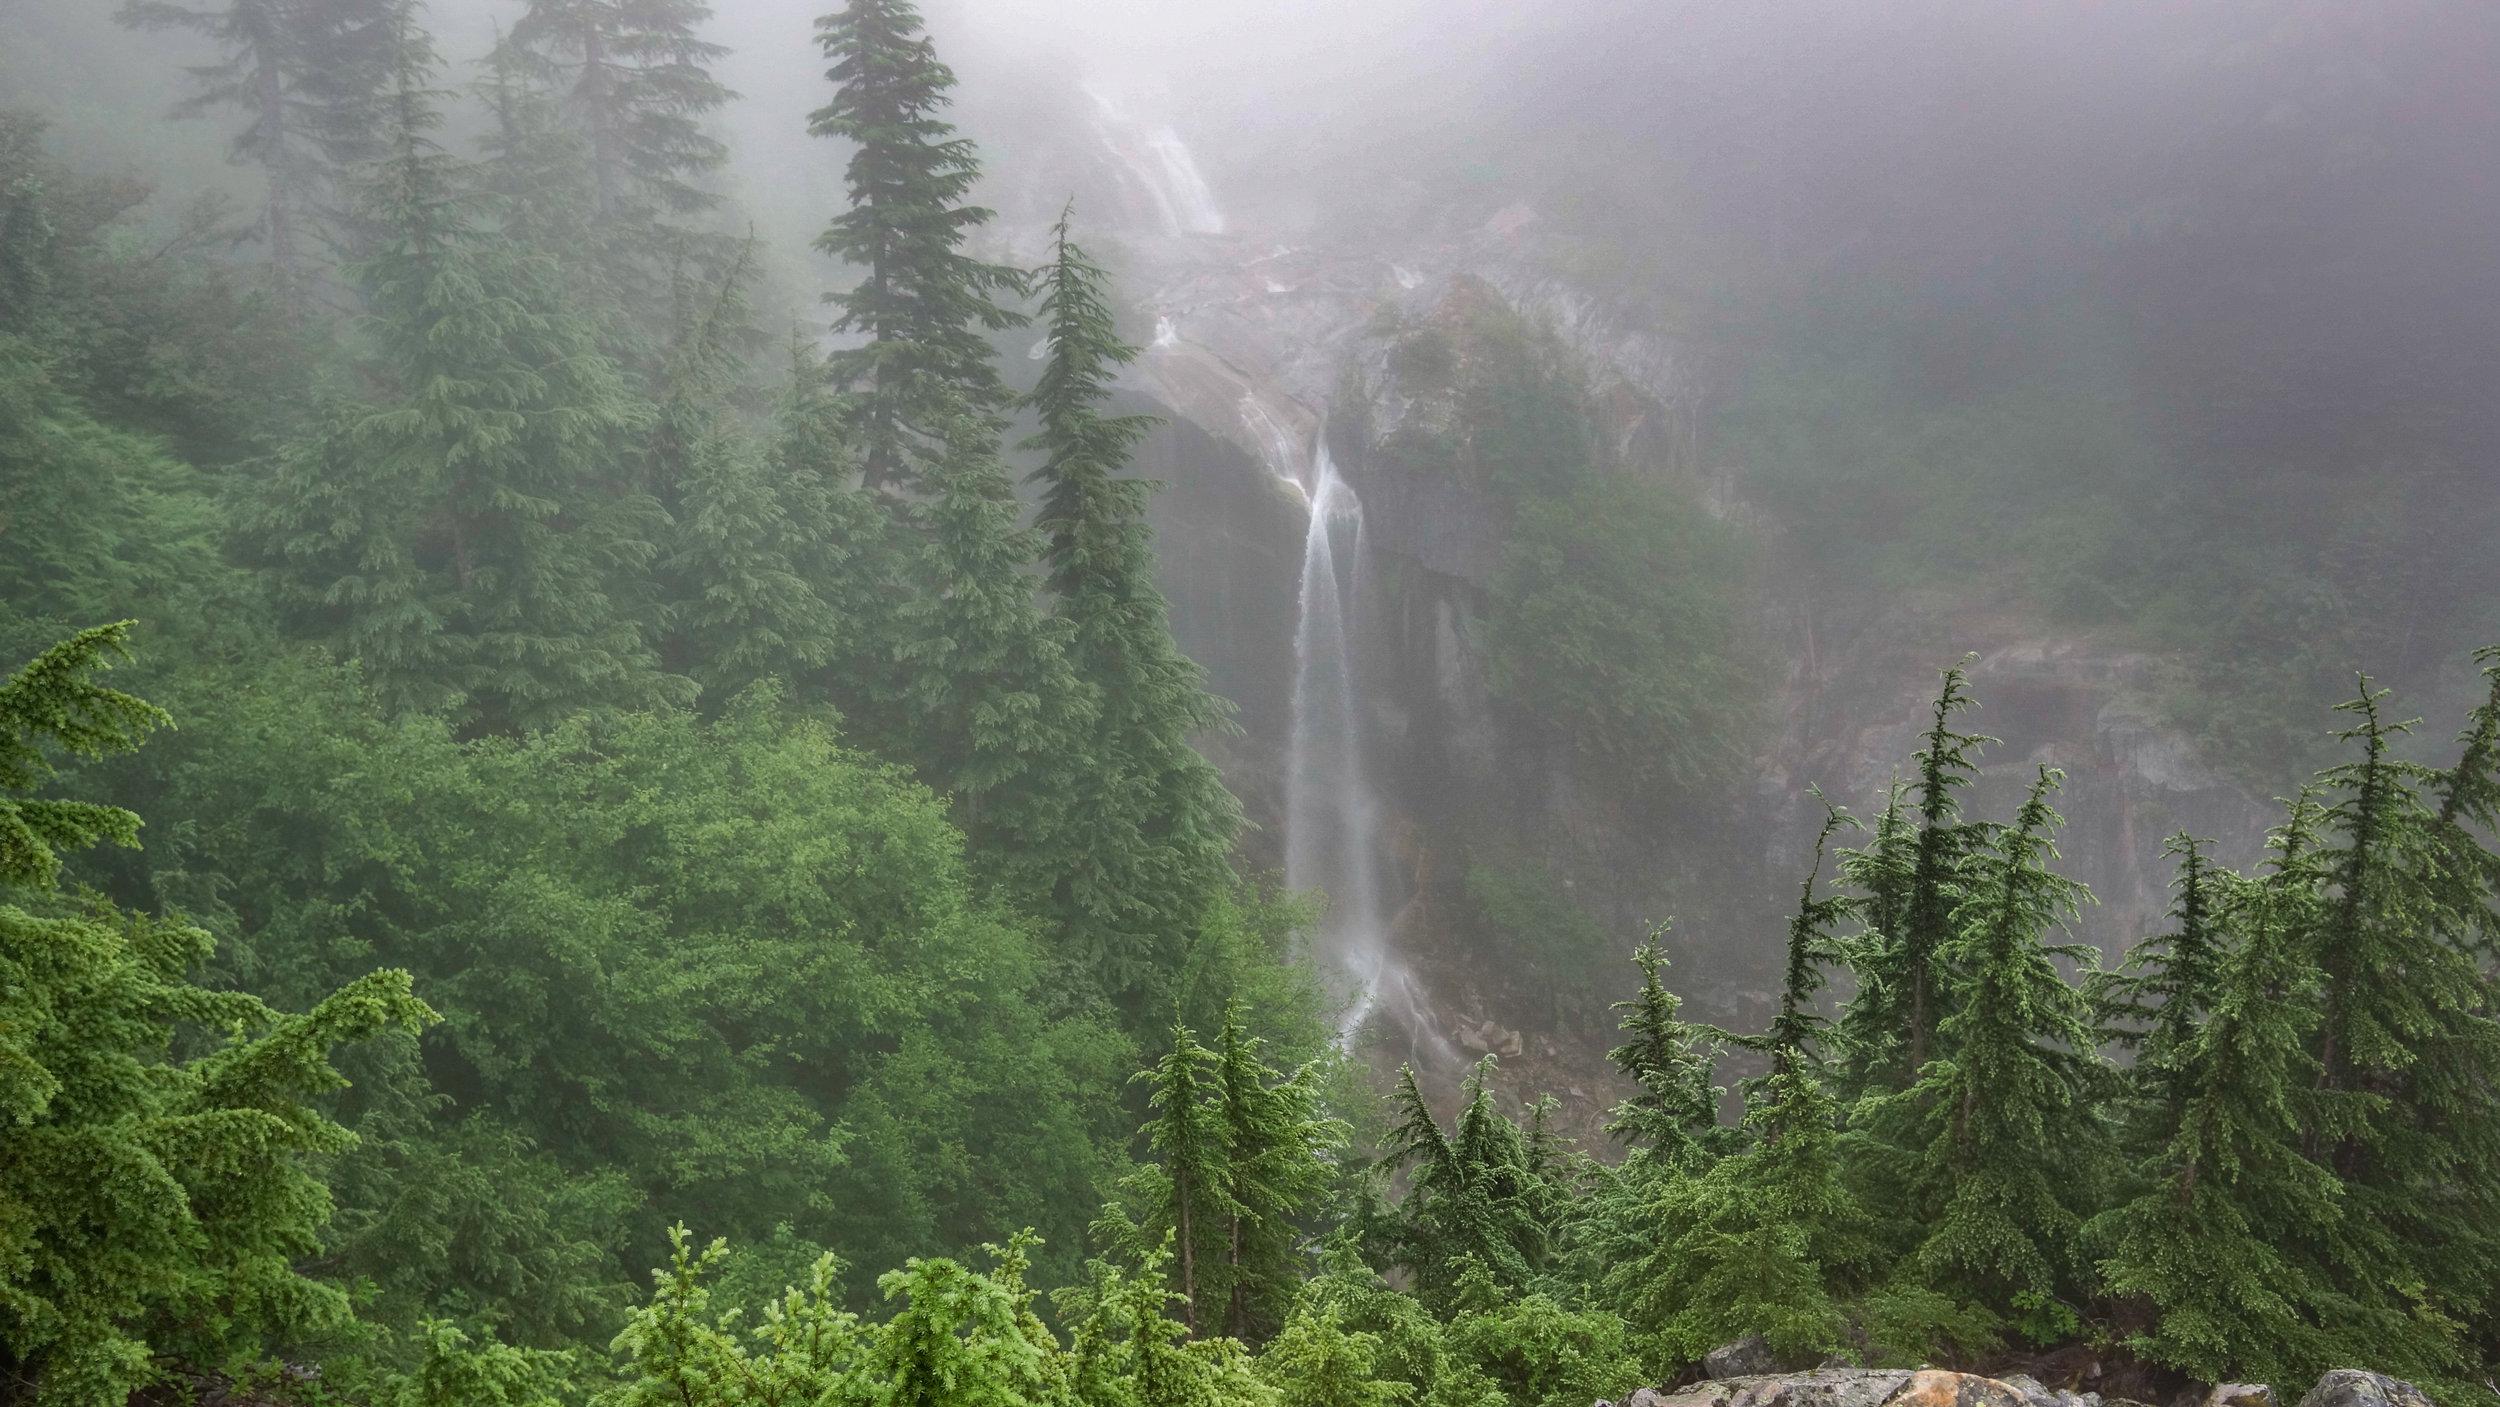 keekwulee falls.jpg